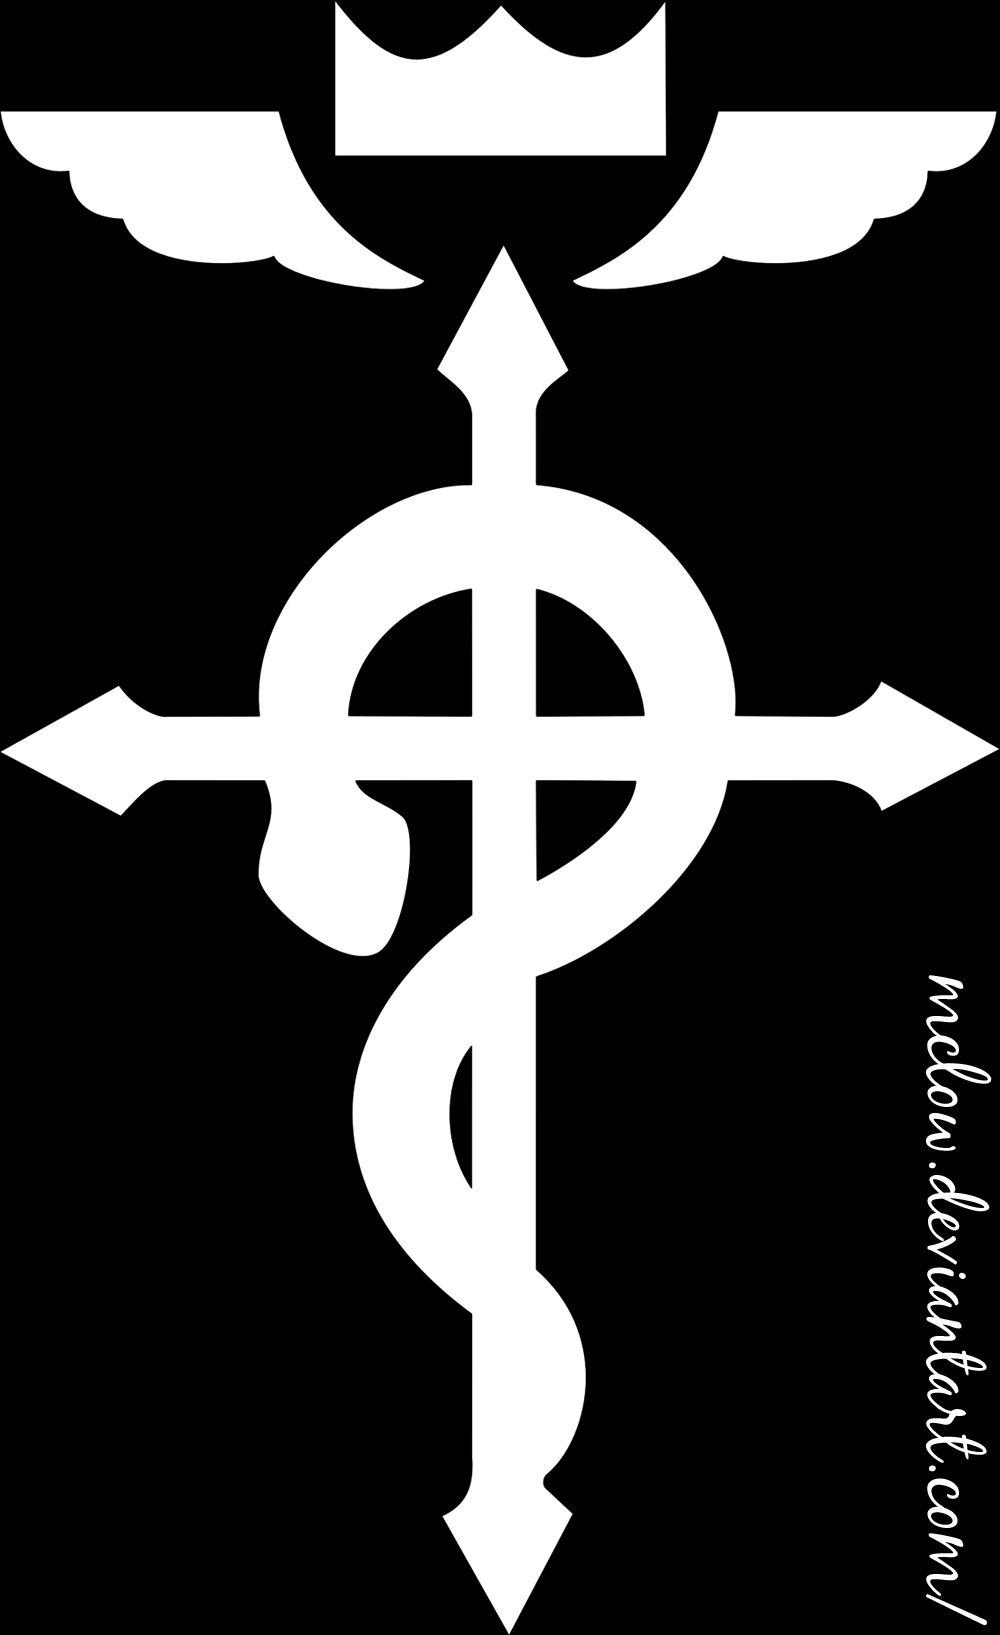 Fma Symbol Fullmetal Alchemist Pinterest Symbols Fullmetal